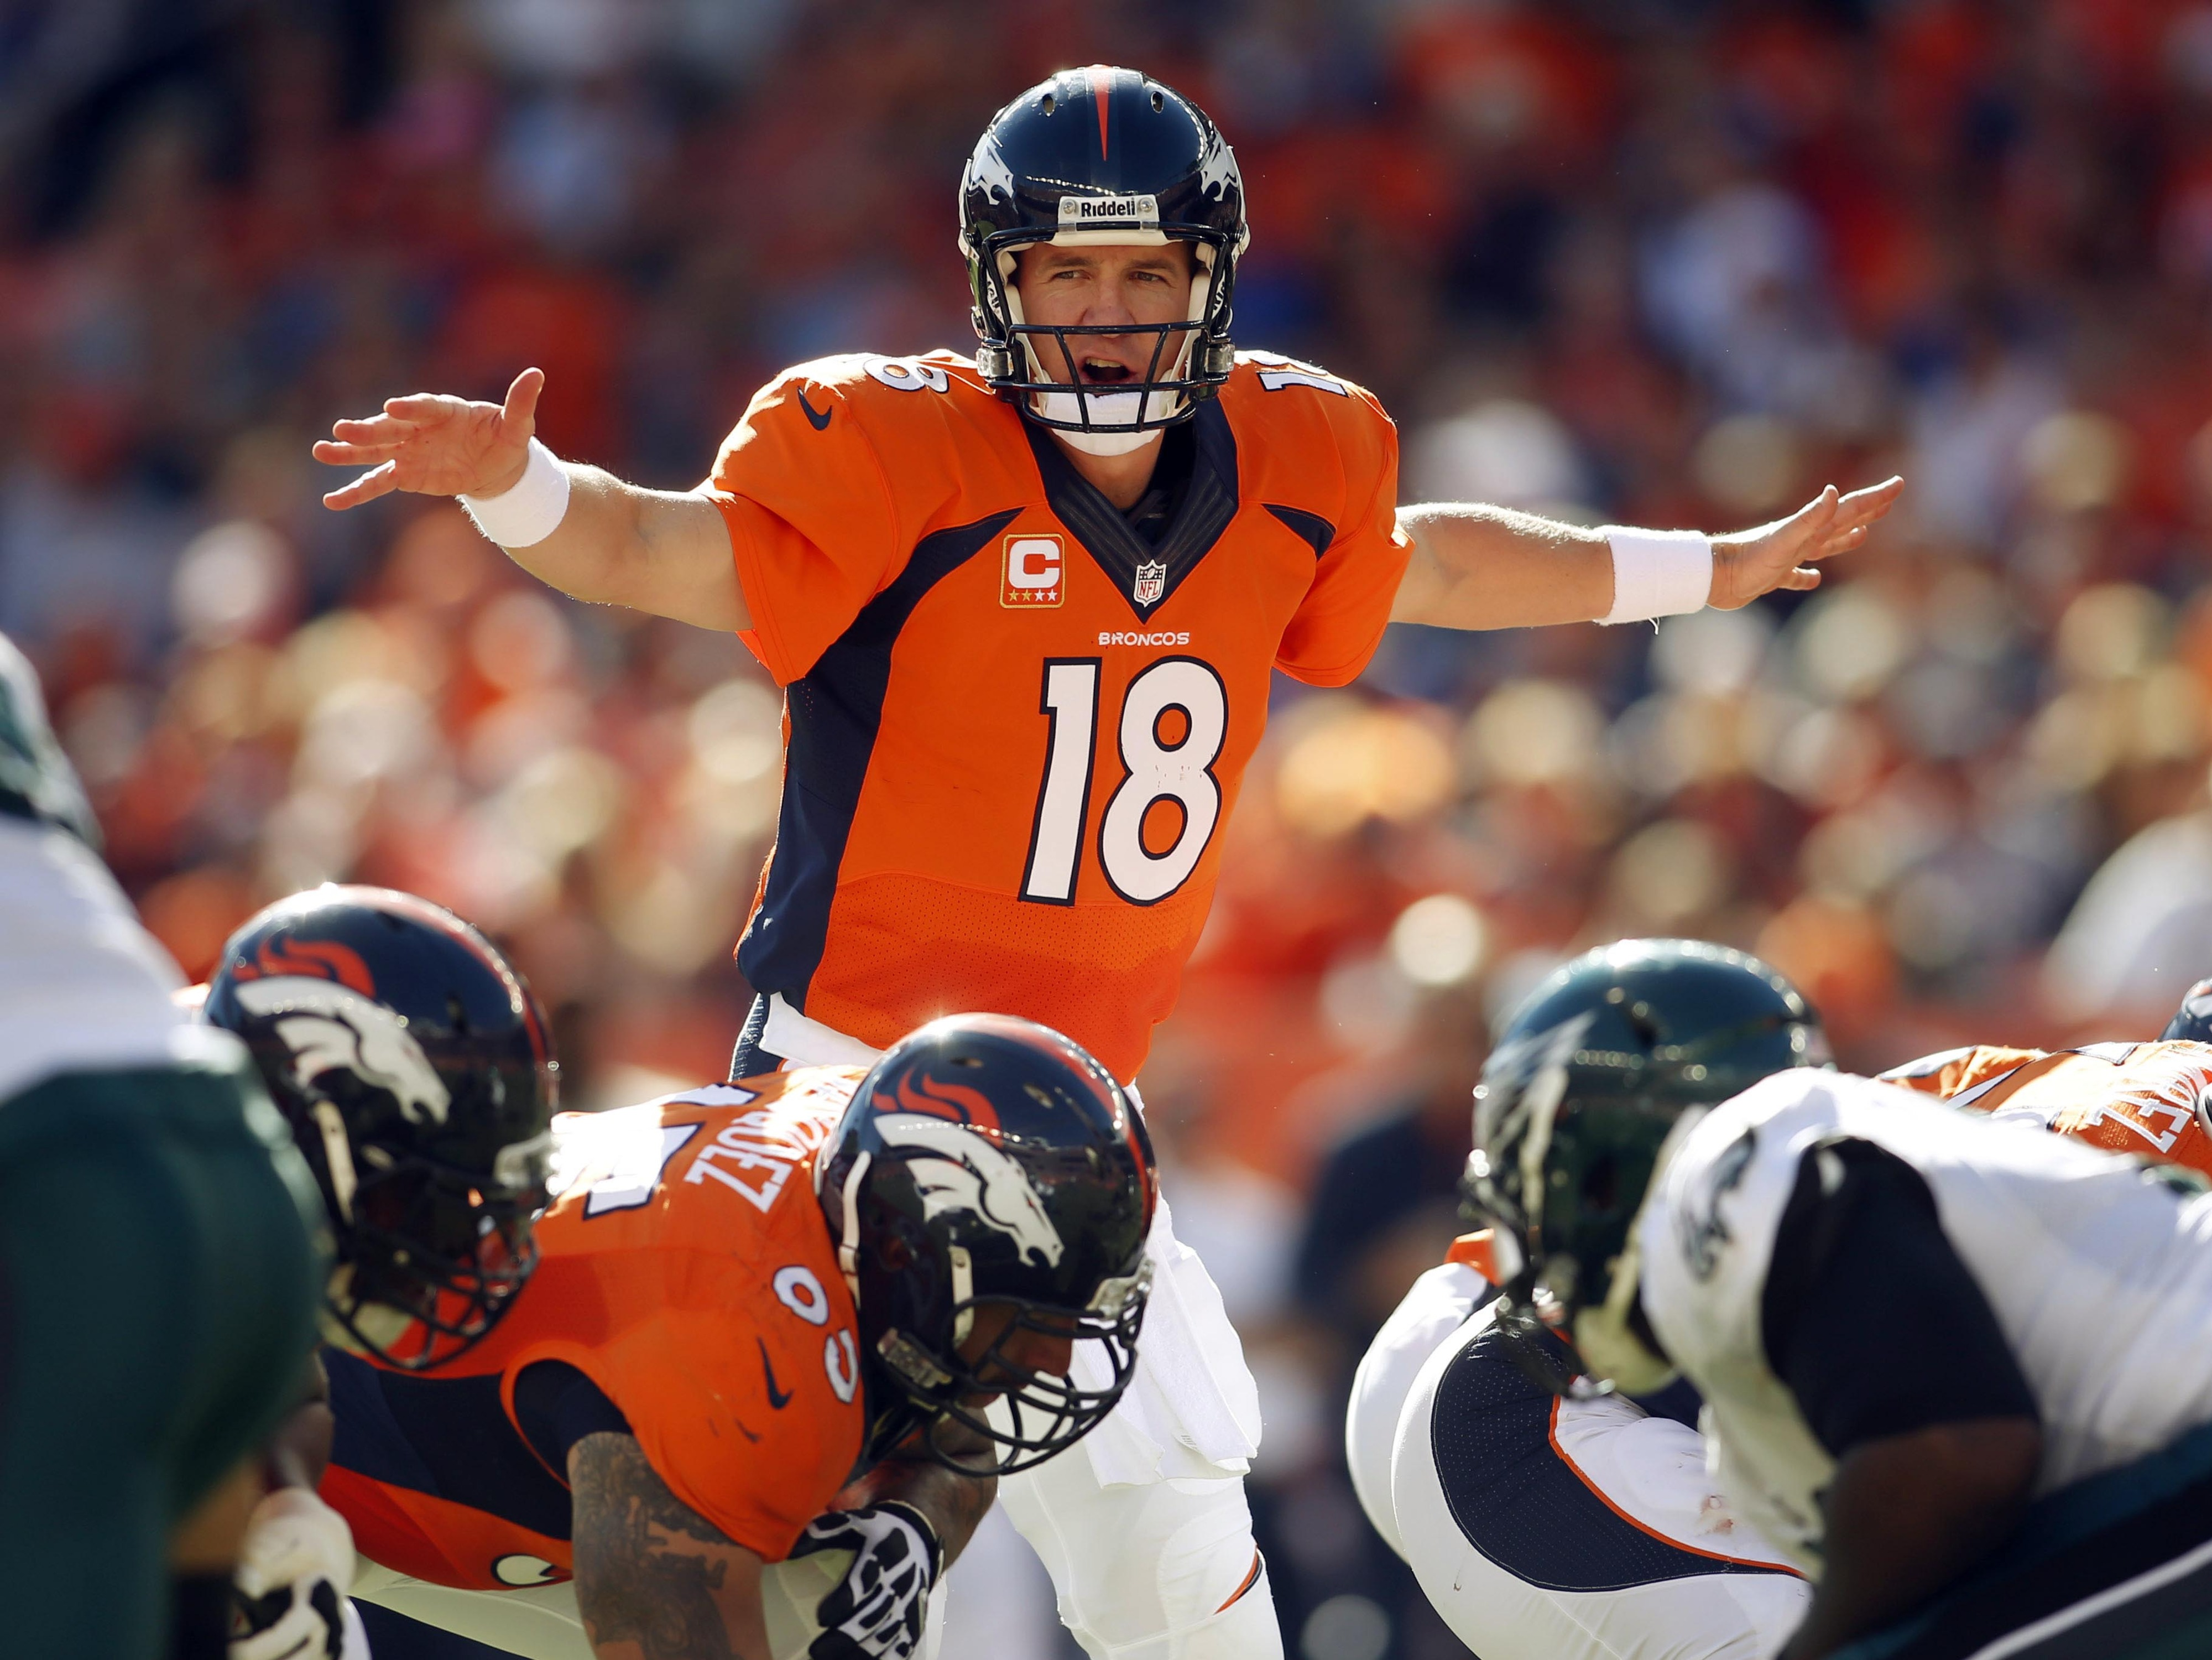 Eagles vs. Broncos 2013 game recap: Denver stomps Philadelphia, 52-20